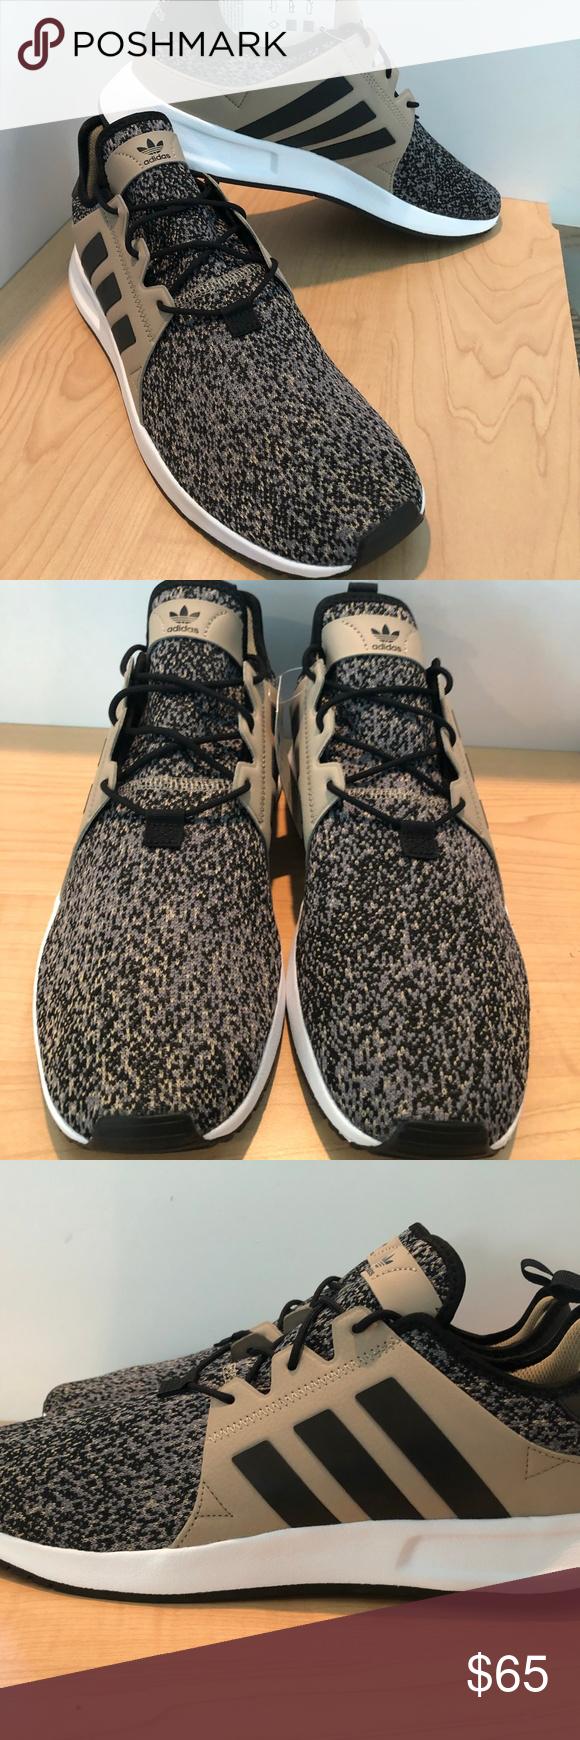 Adidas XPLR Khaki/Black/White Athletic